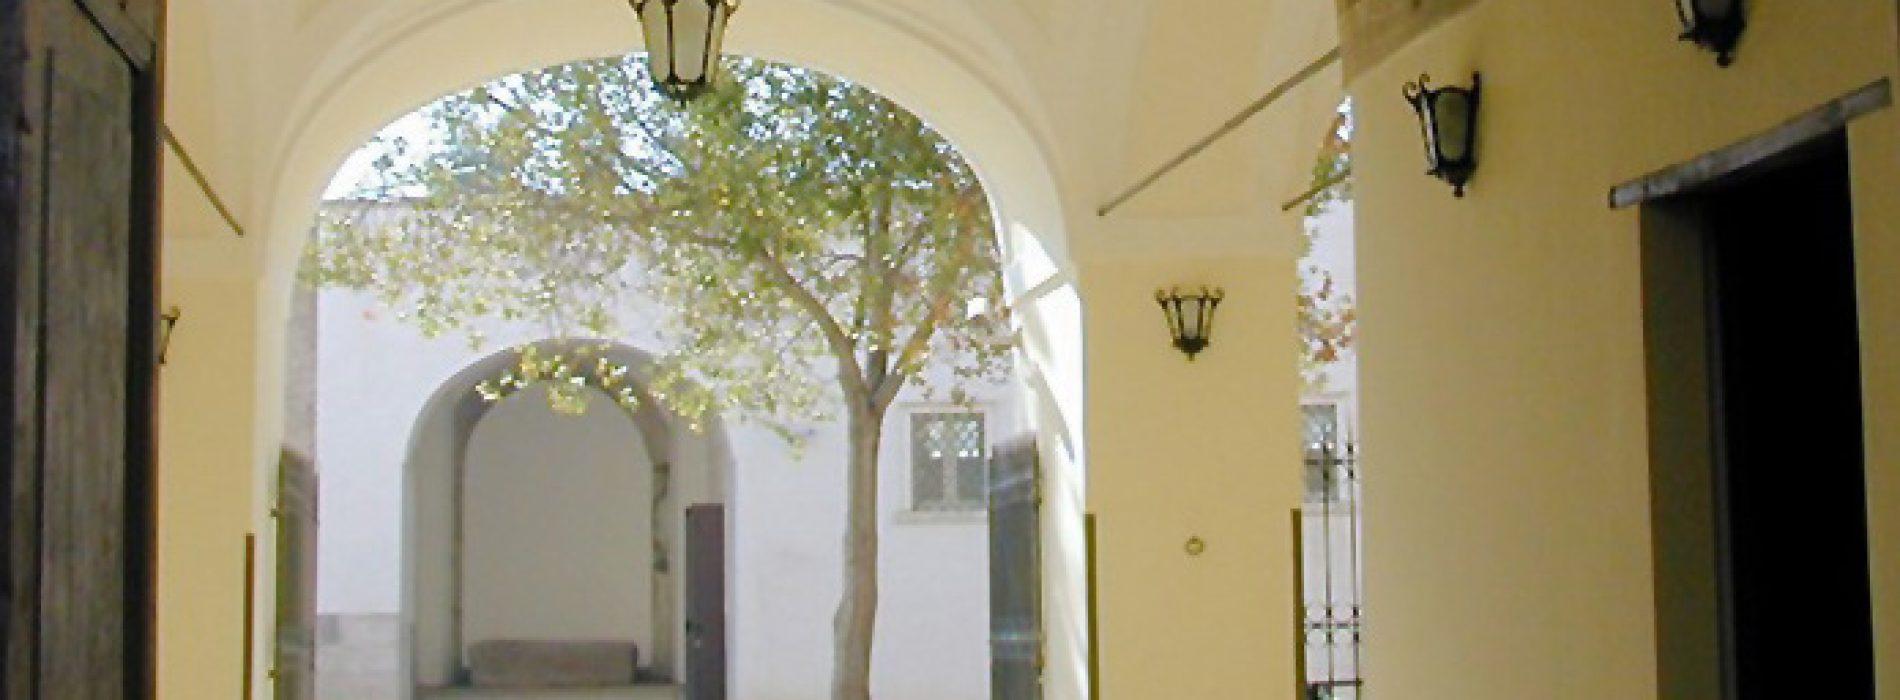 Metamorfosi di Dafne, un Teatro di Pietra è nel Museo Calatia